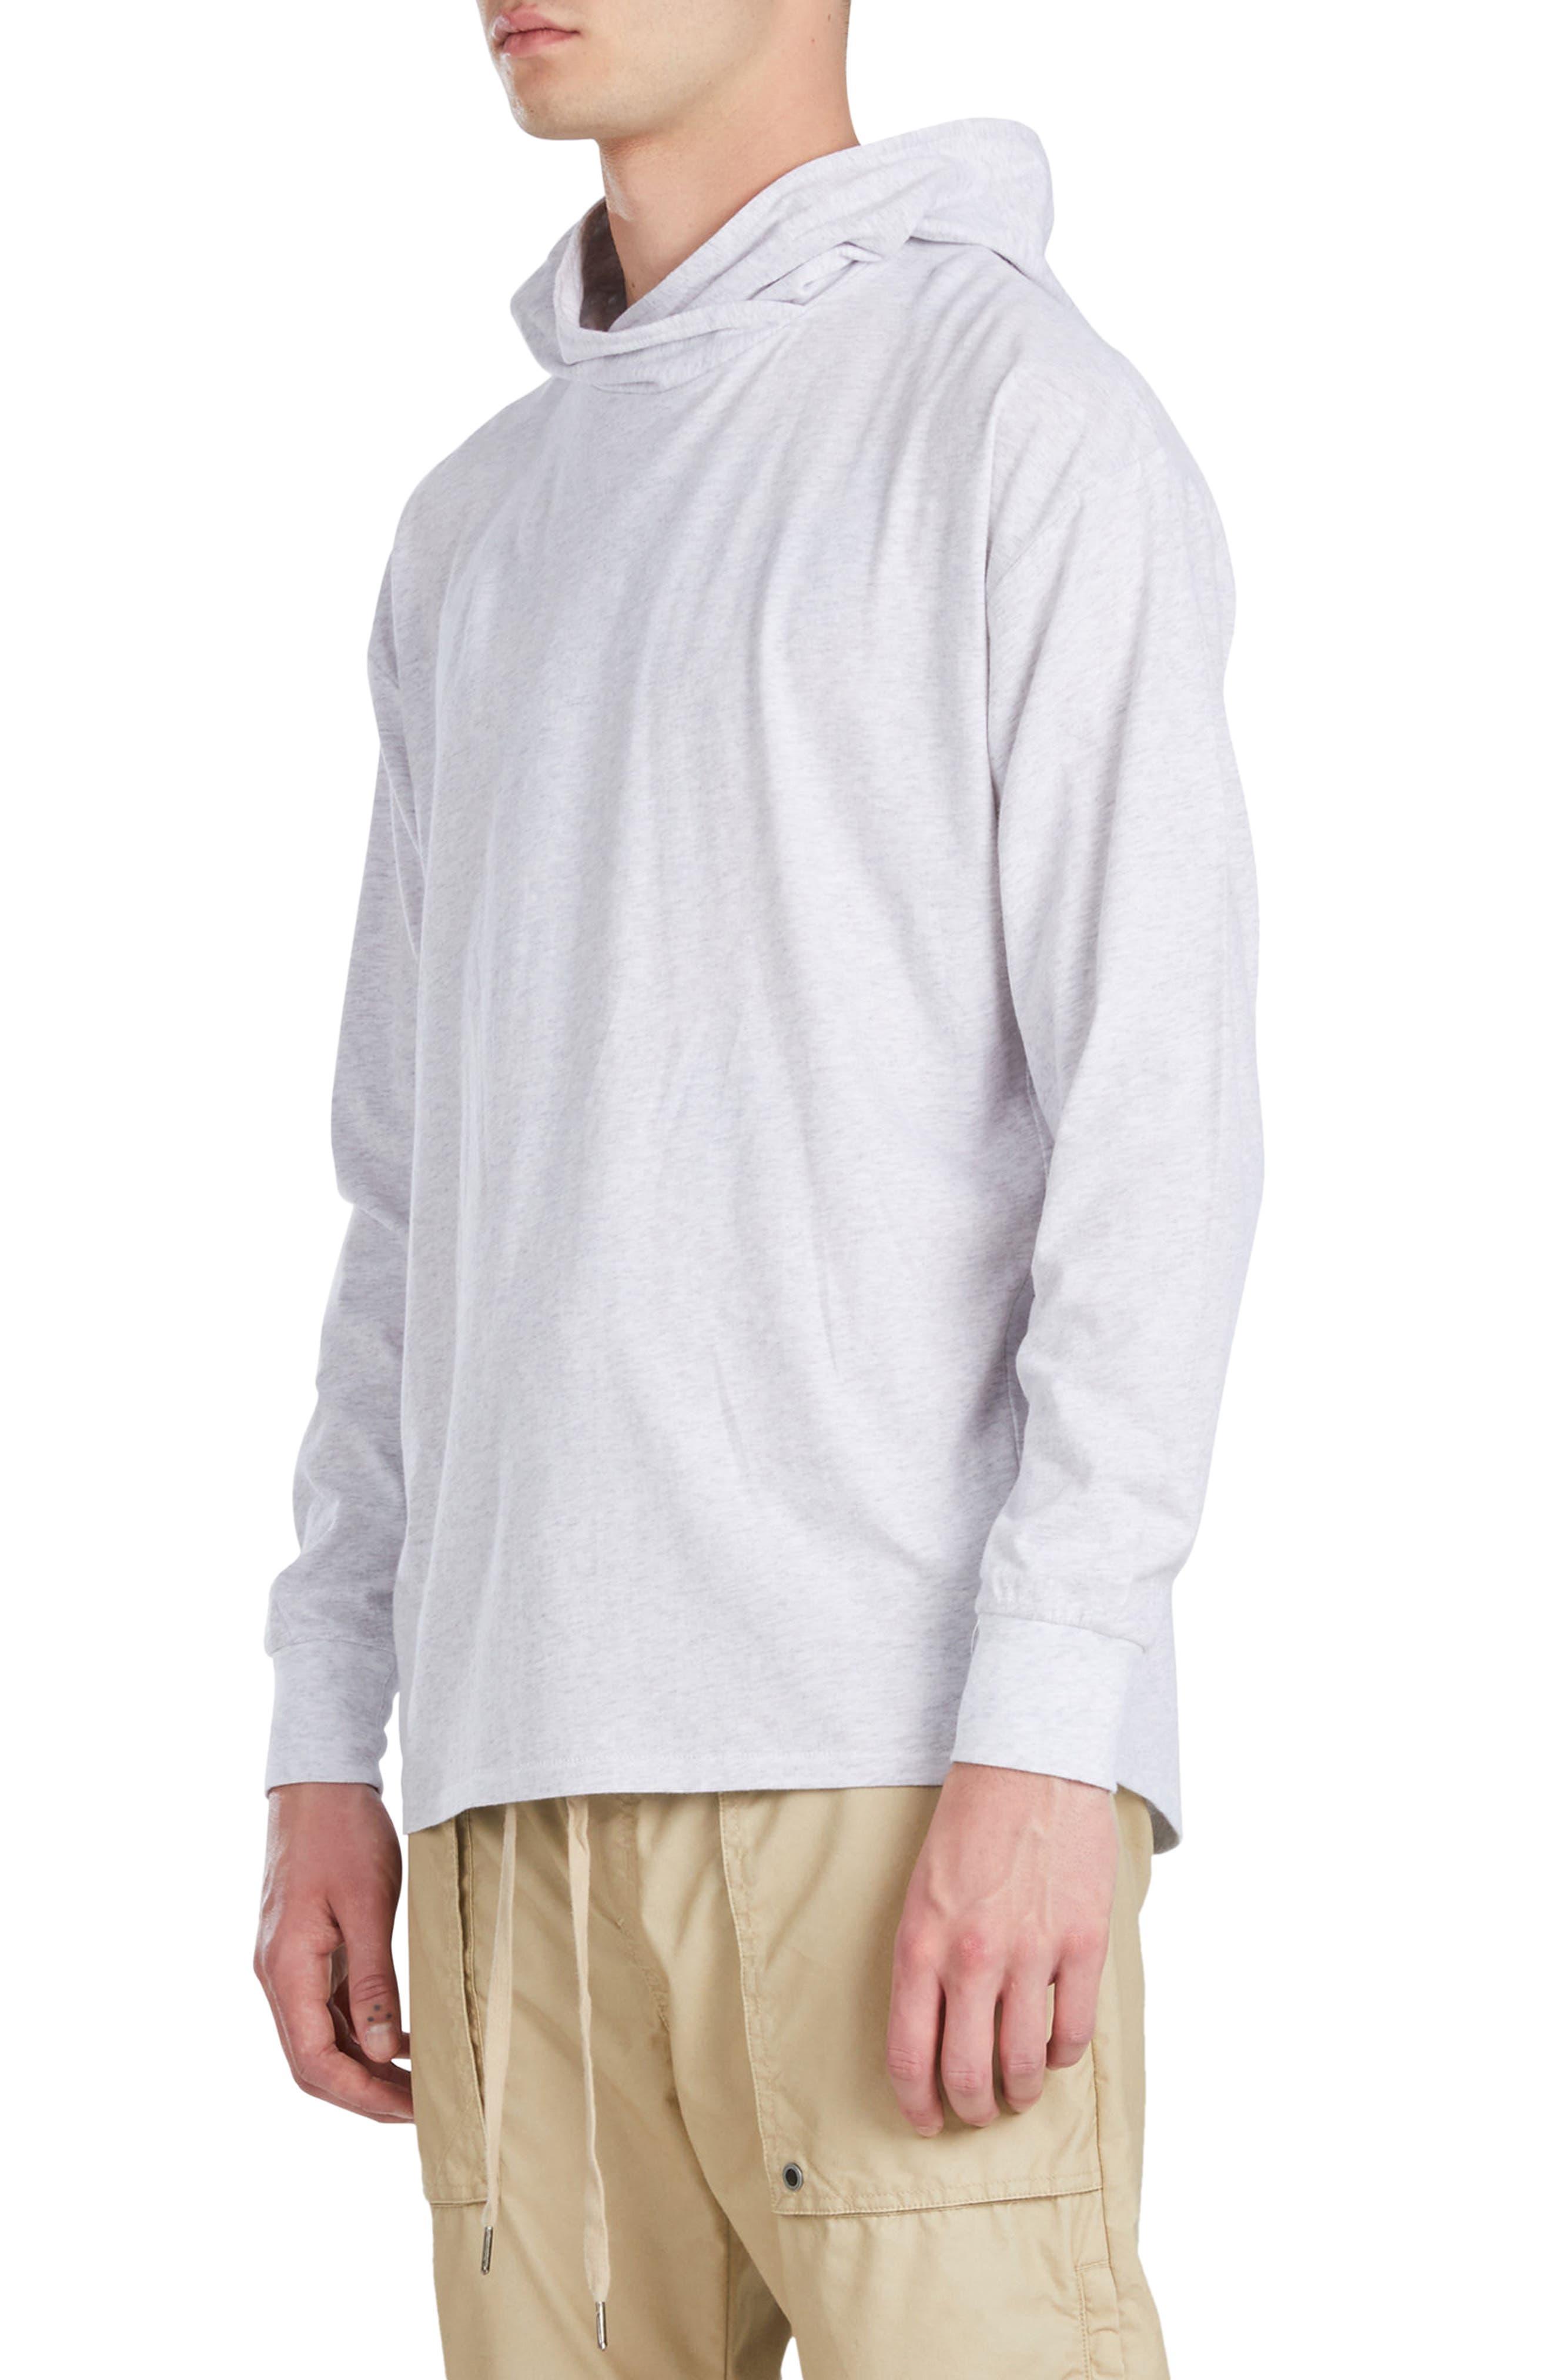 Rugger Long Sleeve Hooded T-Shirt,                             Alternate thumbnail 3, color,                             051